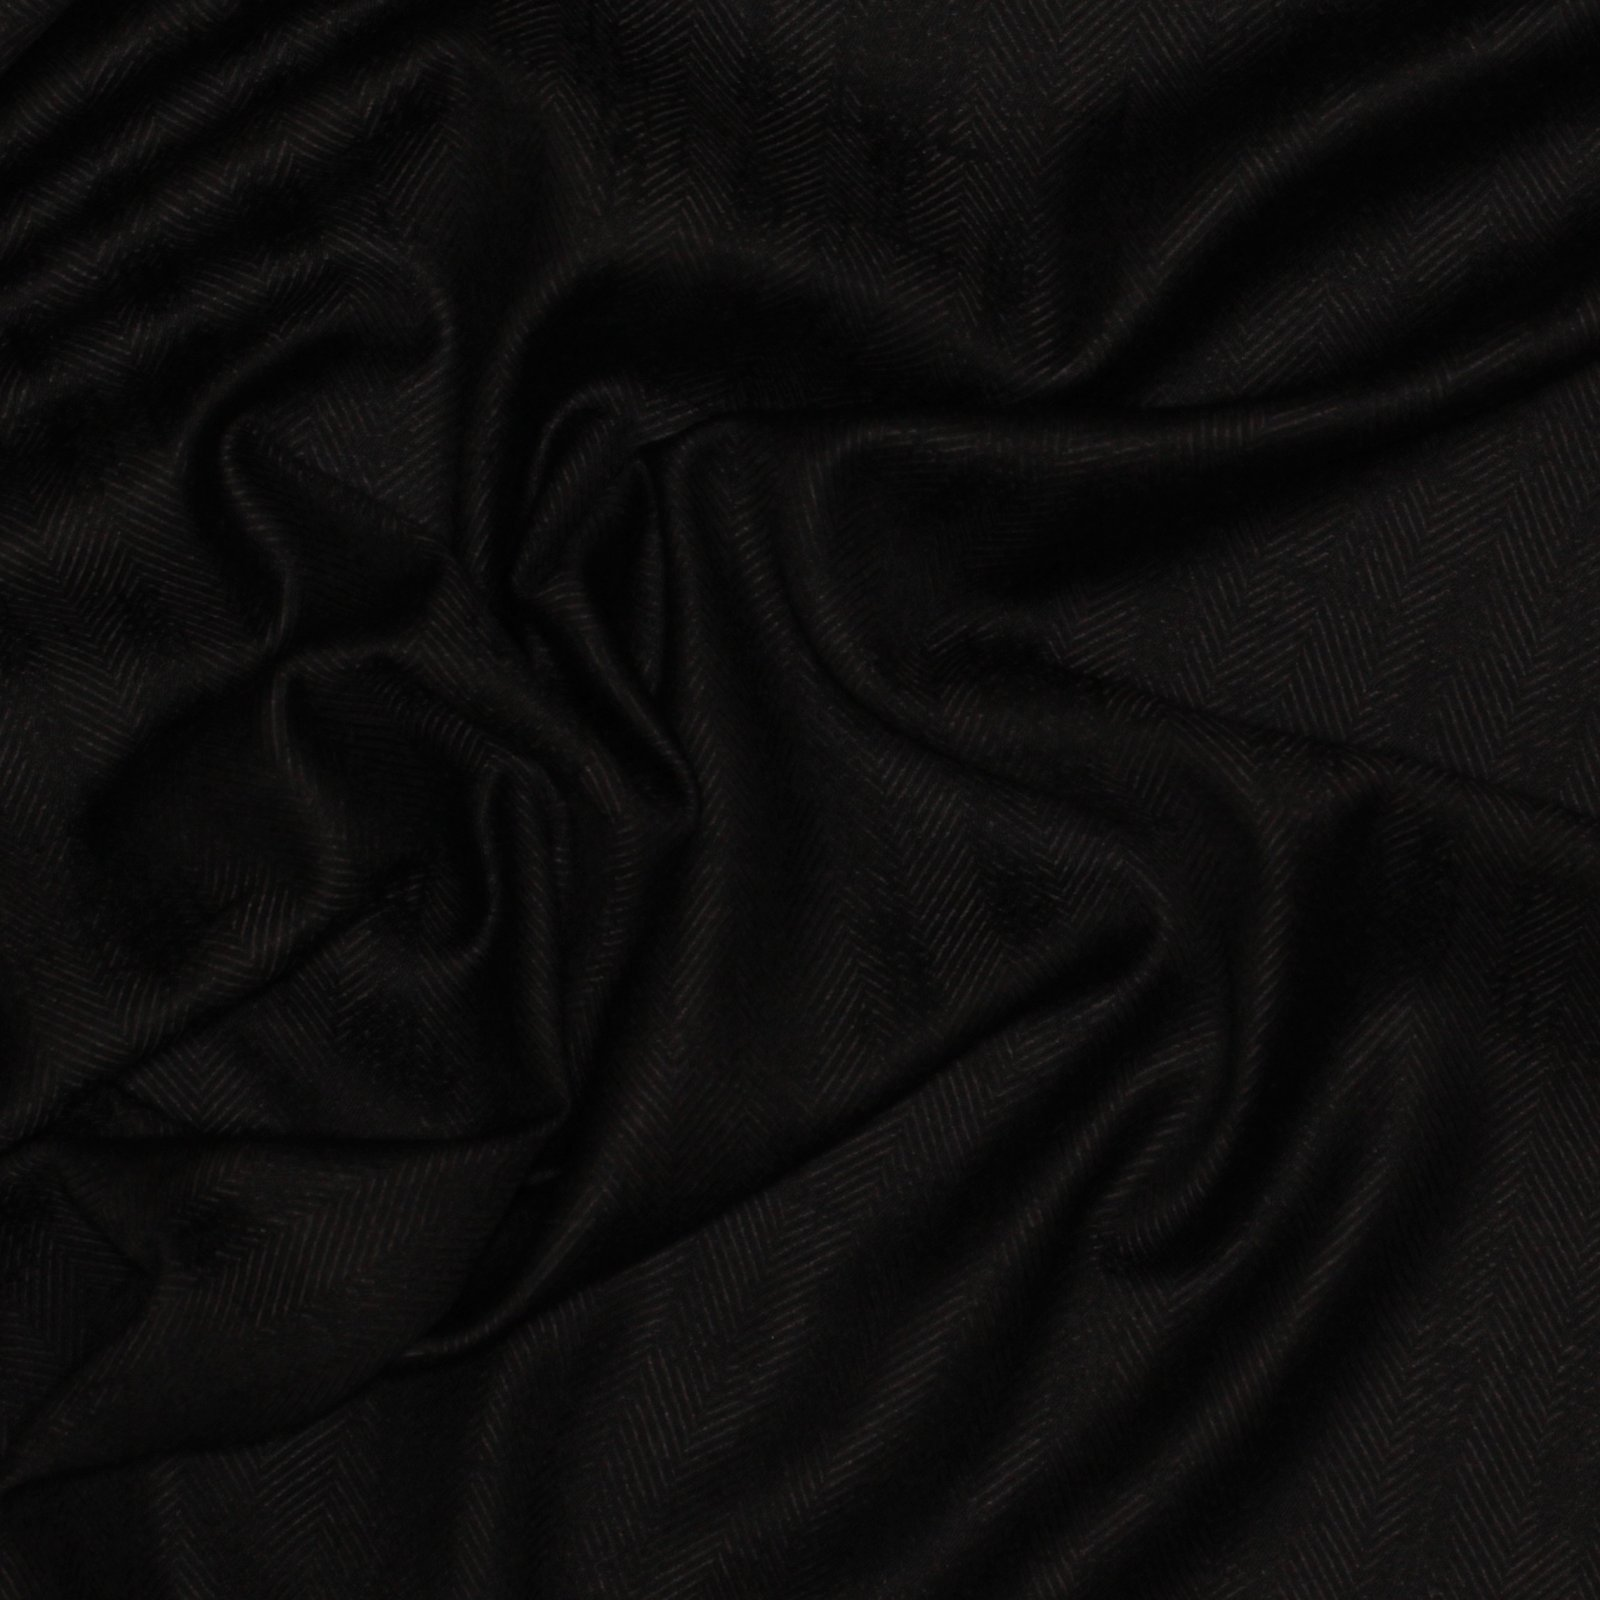 Black Herringbone Distressed Look Italian Wool/Cashmere Blend; 60